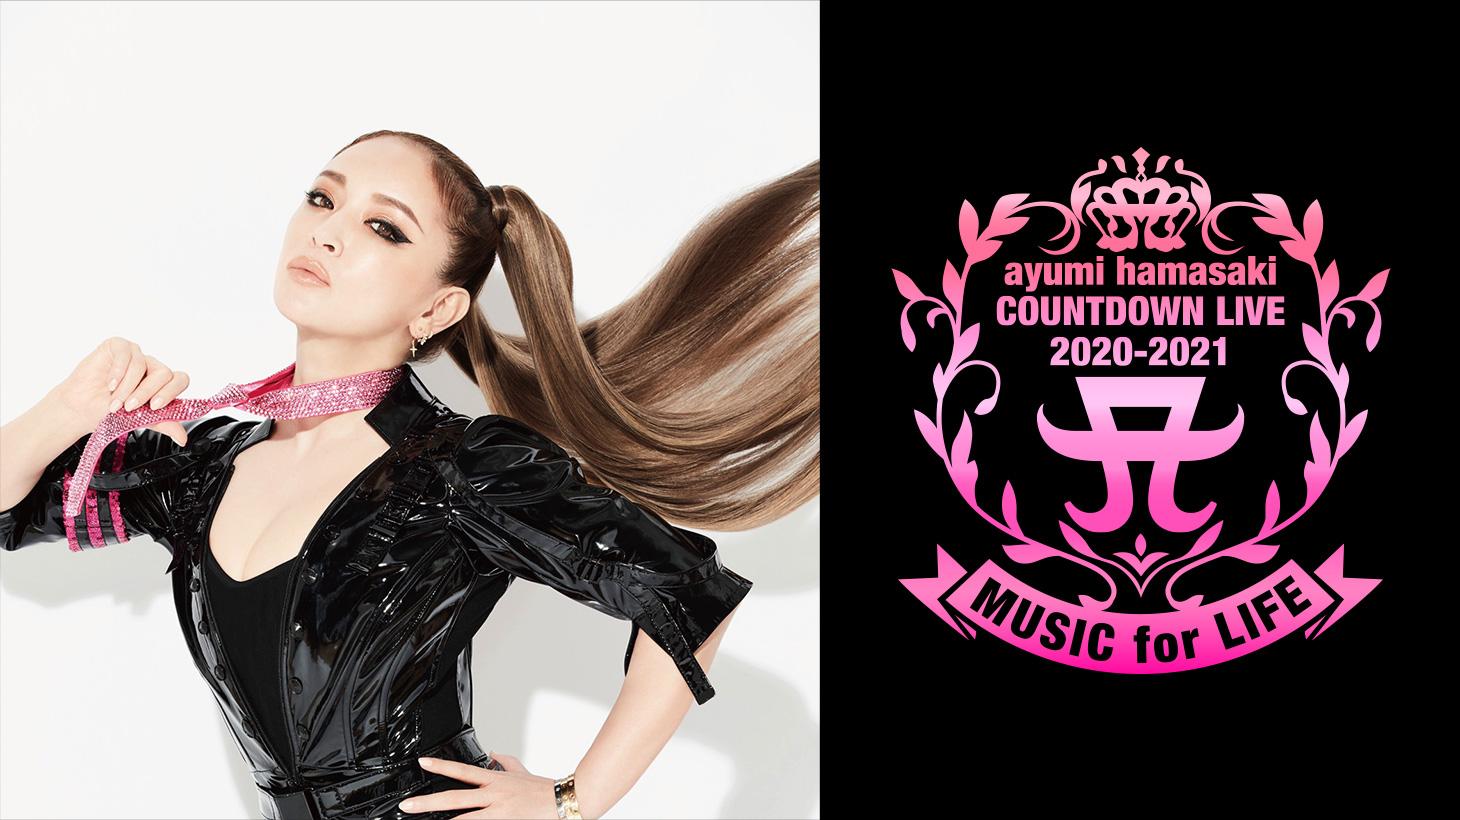 ayumi hamasaki COUNTDOWN LIVE 2020-2021 A ~MUSIC for LIFE~